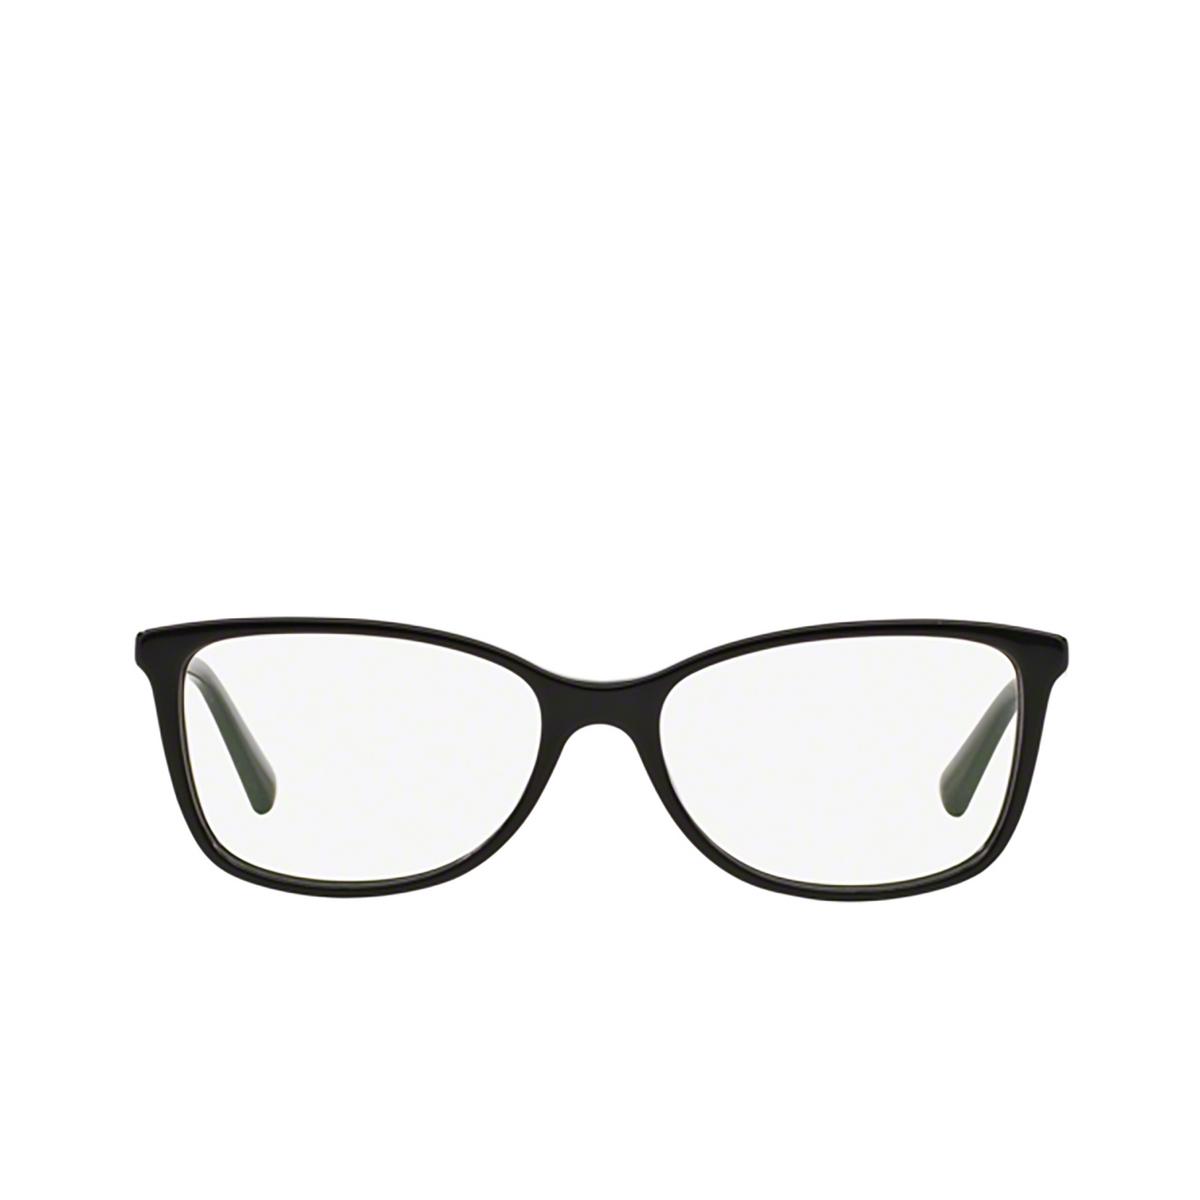 Dolce & Gabbana® Square Eyeglasses: DG3219 color Black 501 - front view.